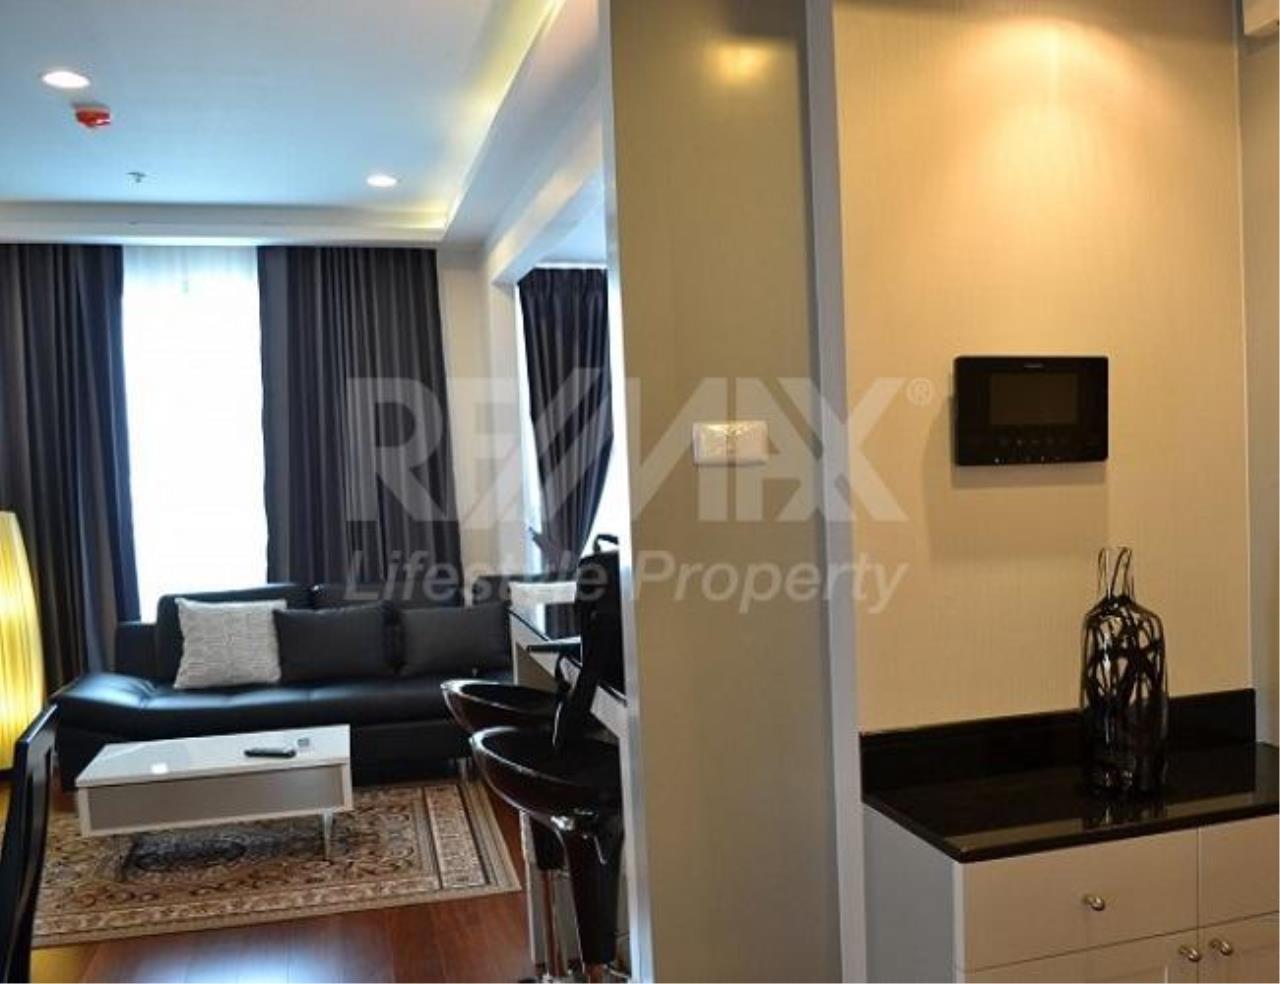 RE/MAX LifeStyle Property Agency's Supalai Lite Sathorn - Charoenrat 3